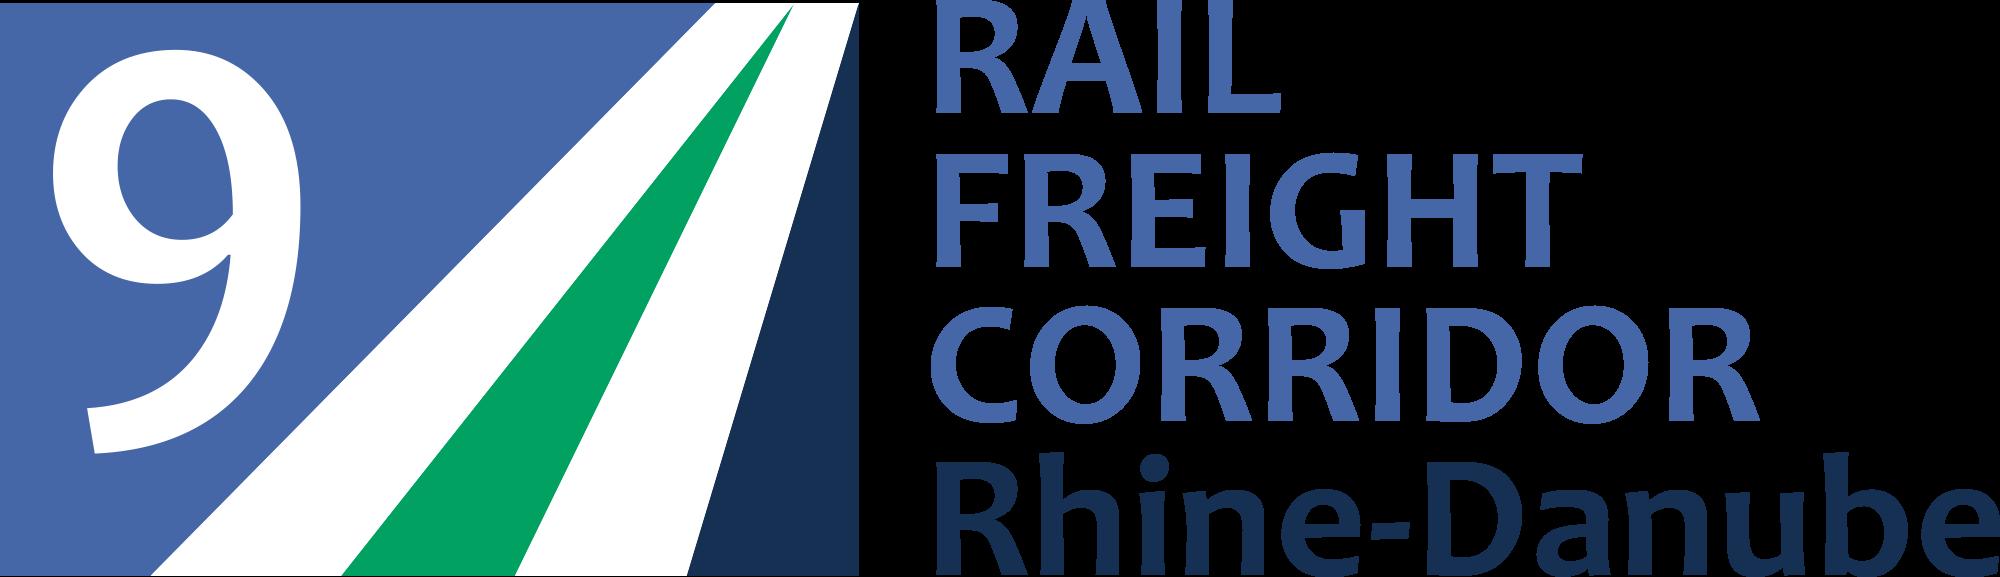 Rail Freight Corridor 9